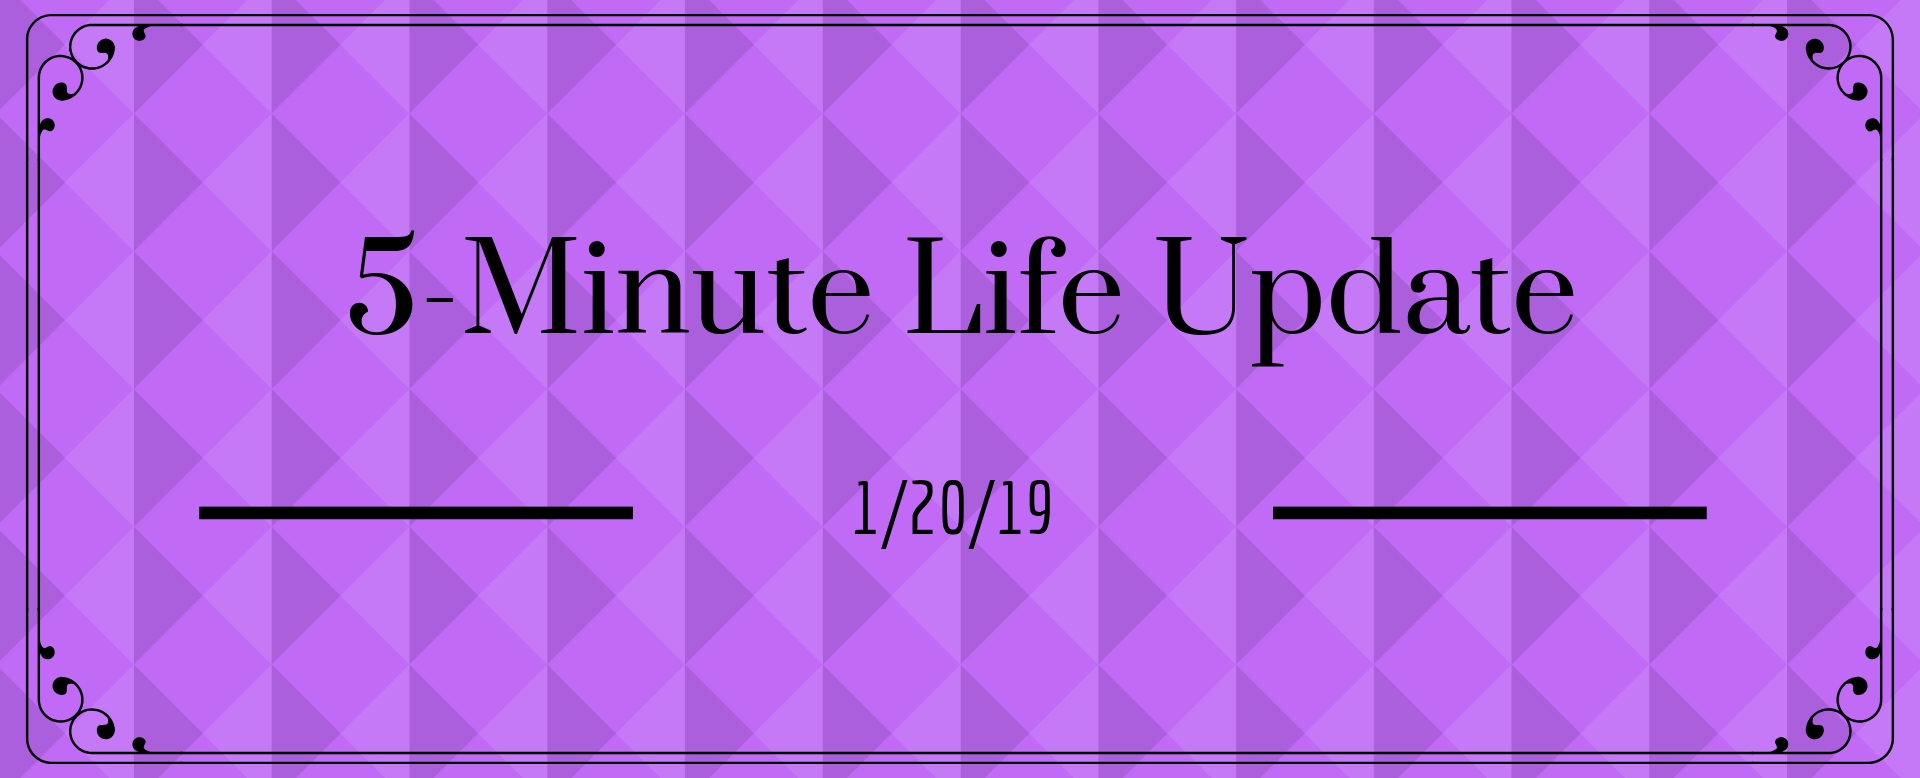 5 Minute Life Update 1/20/19